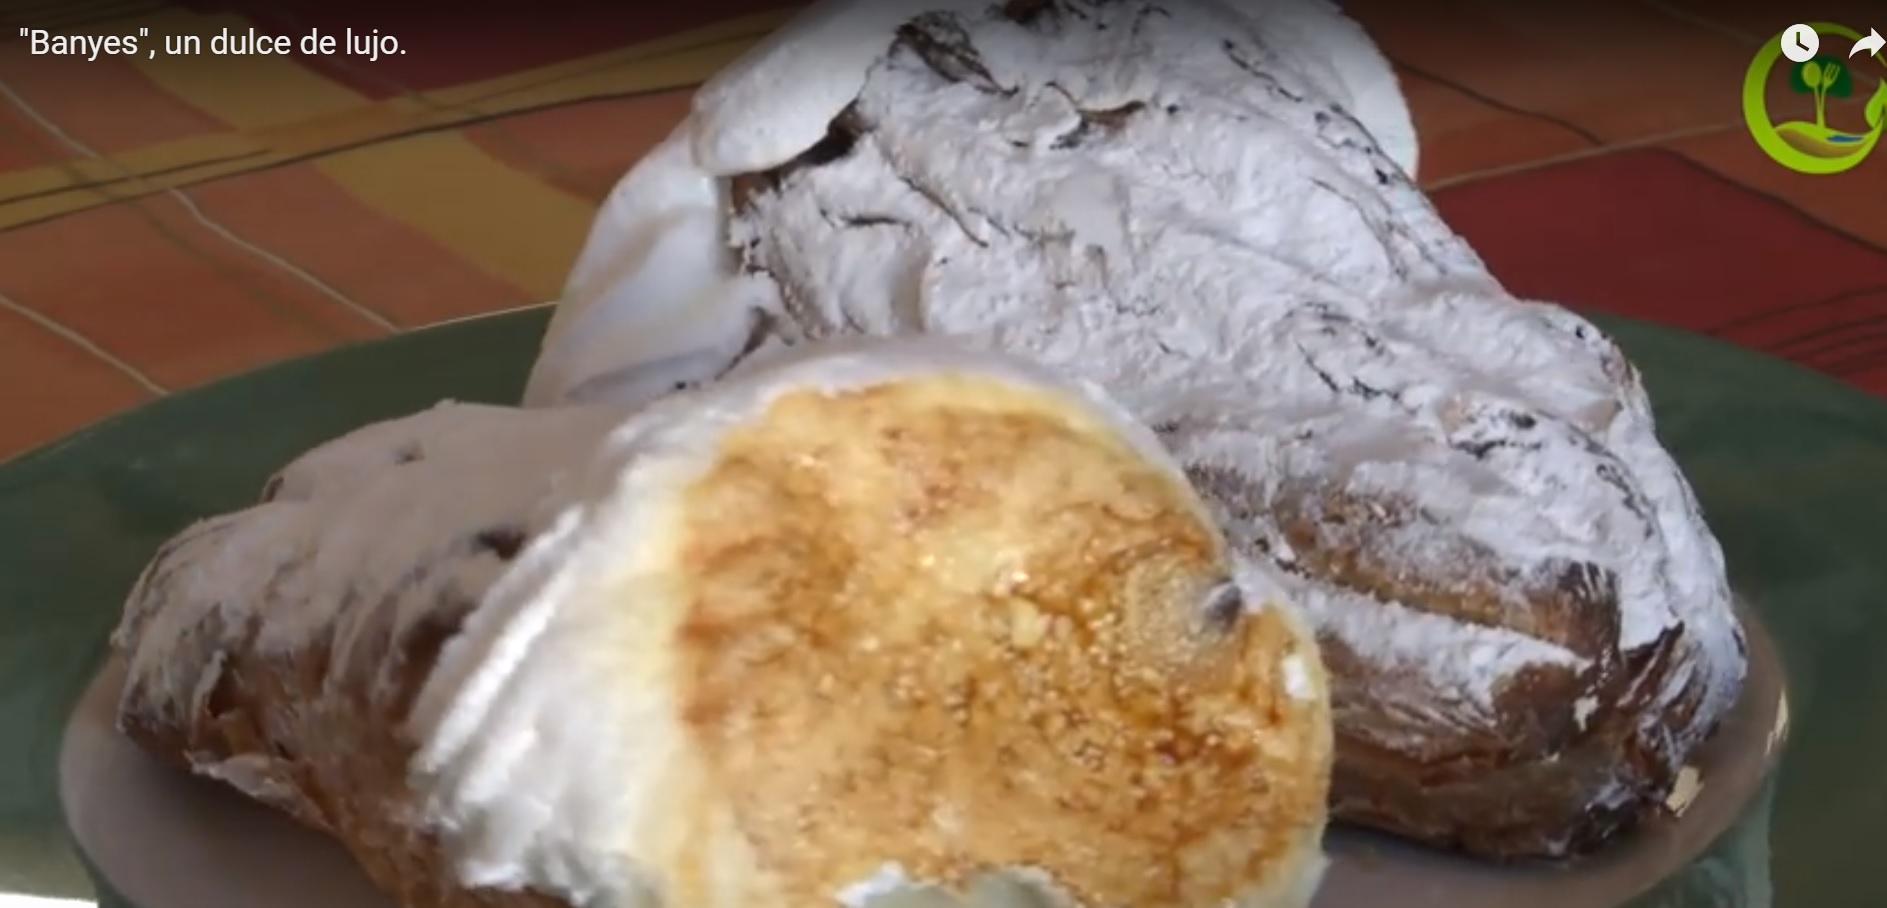 Banyes, un dulce típico de Menorca